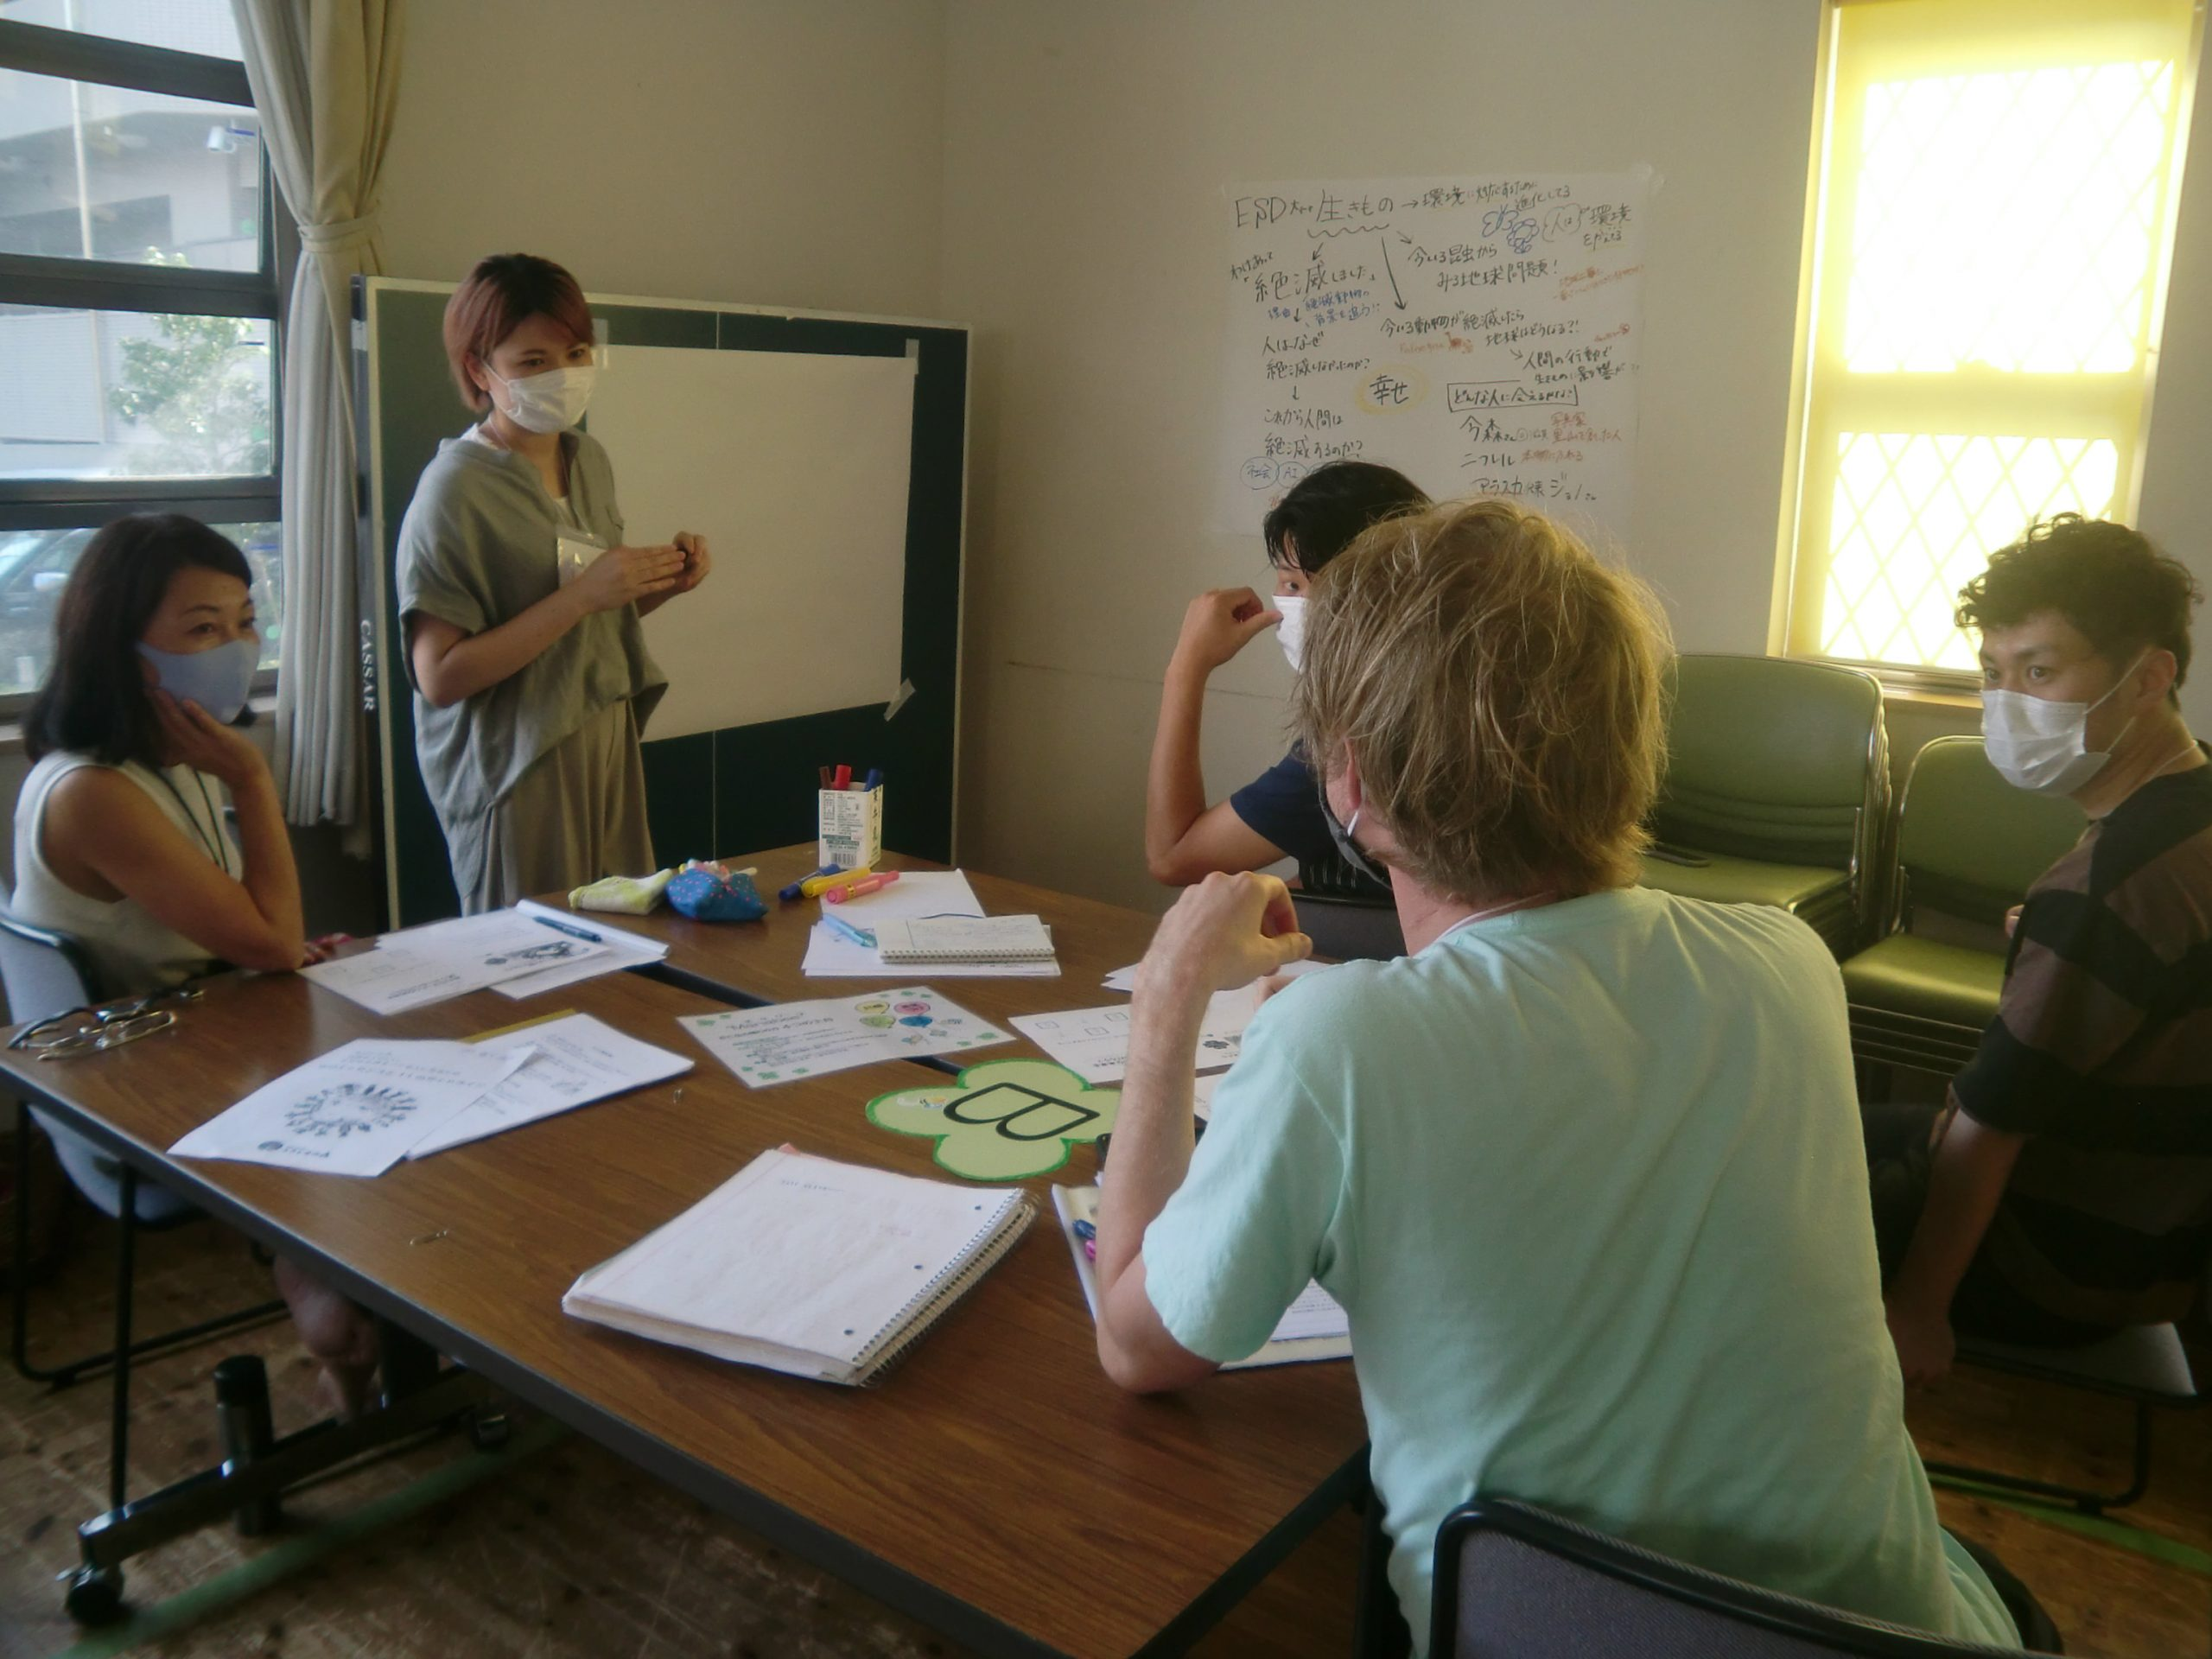 Manabeeプログラム④ 「つながる時代のはじめの一歩」